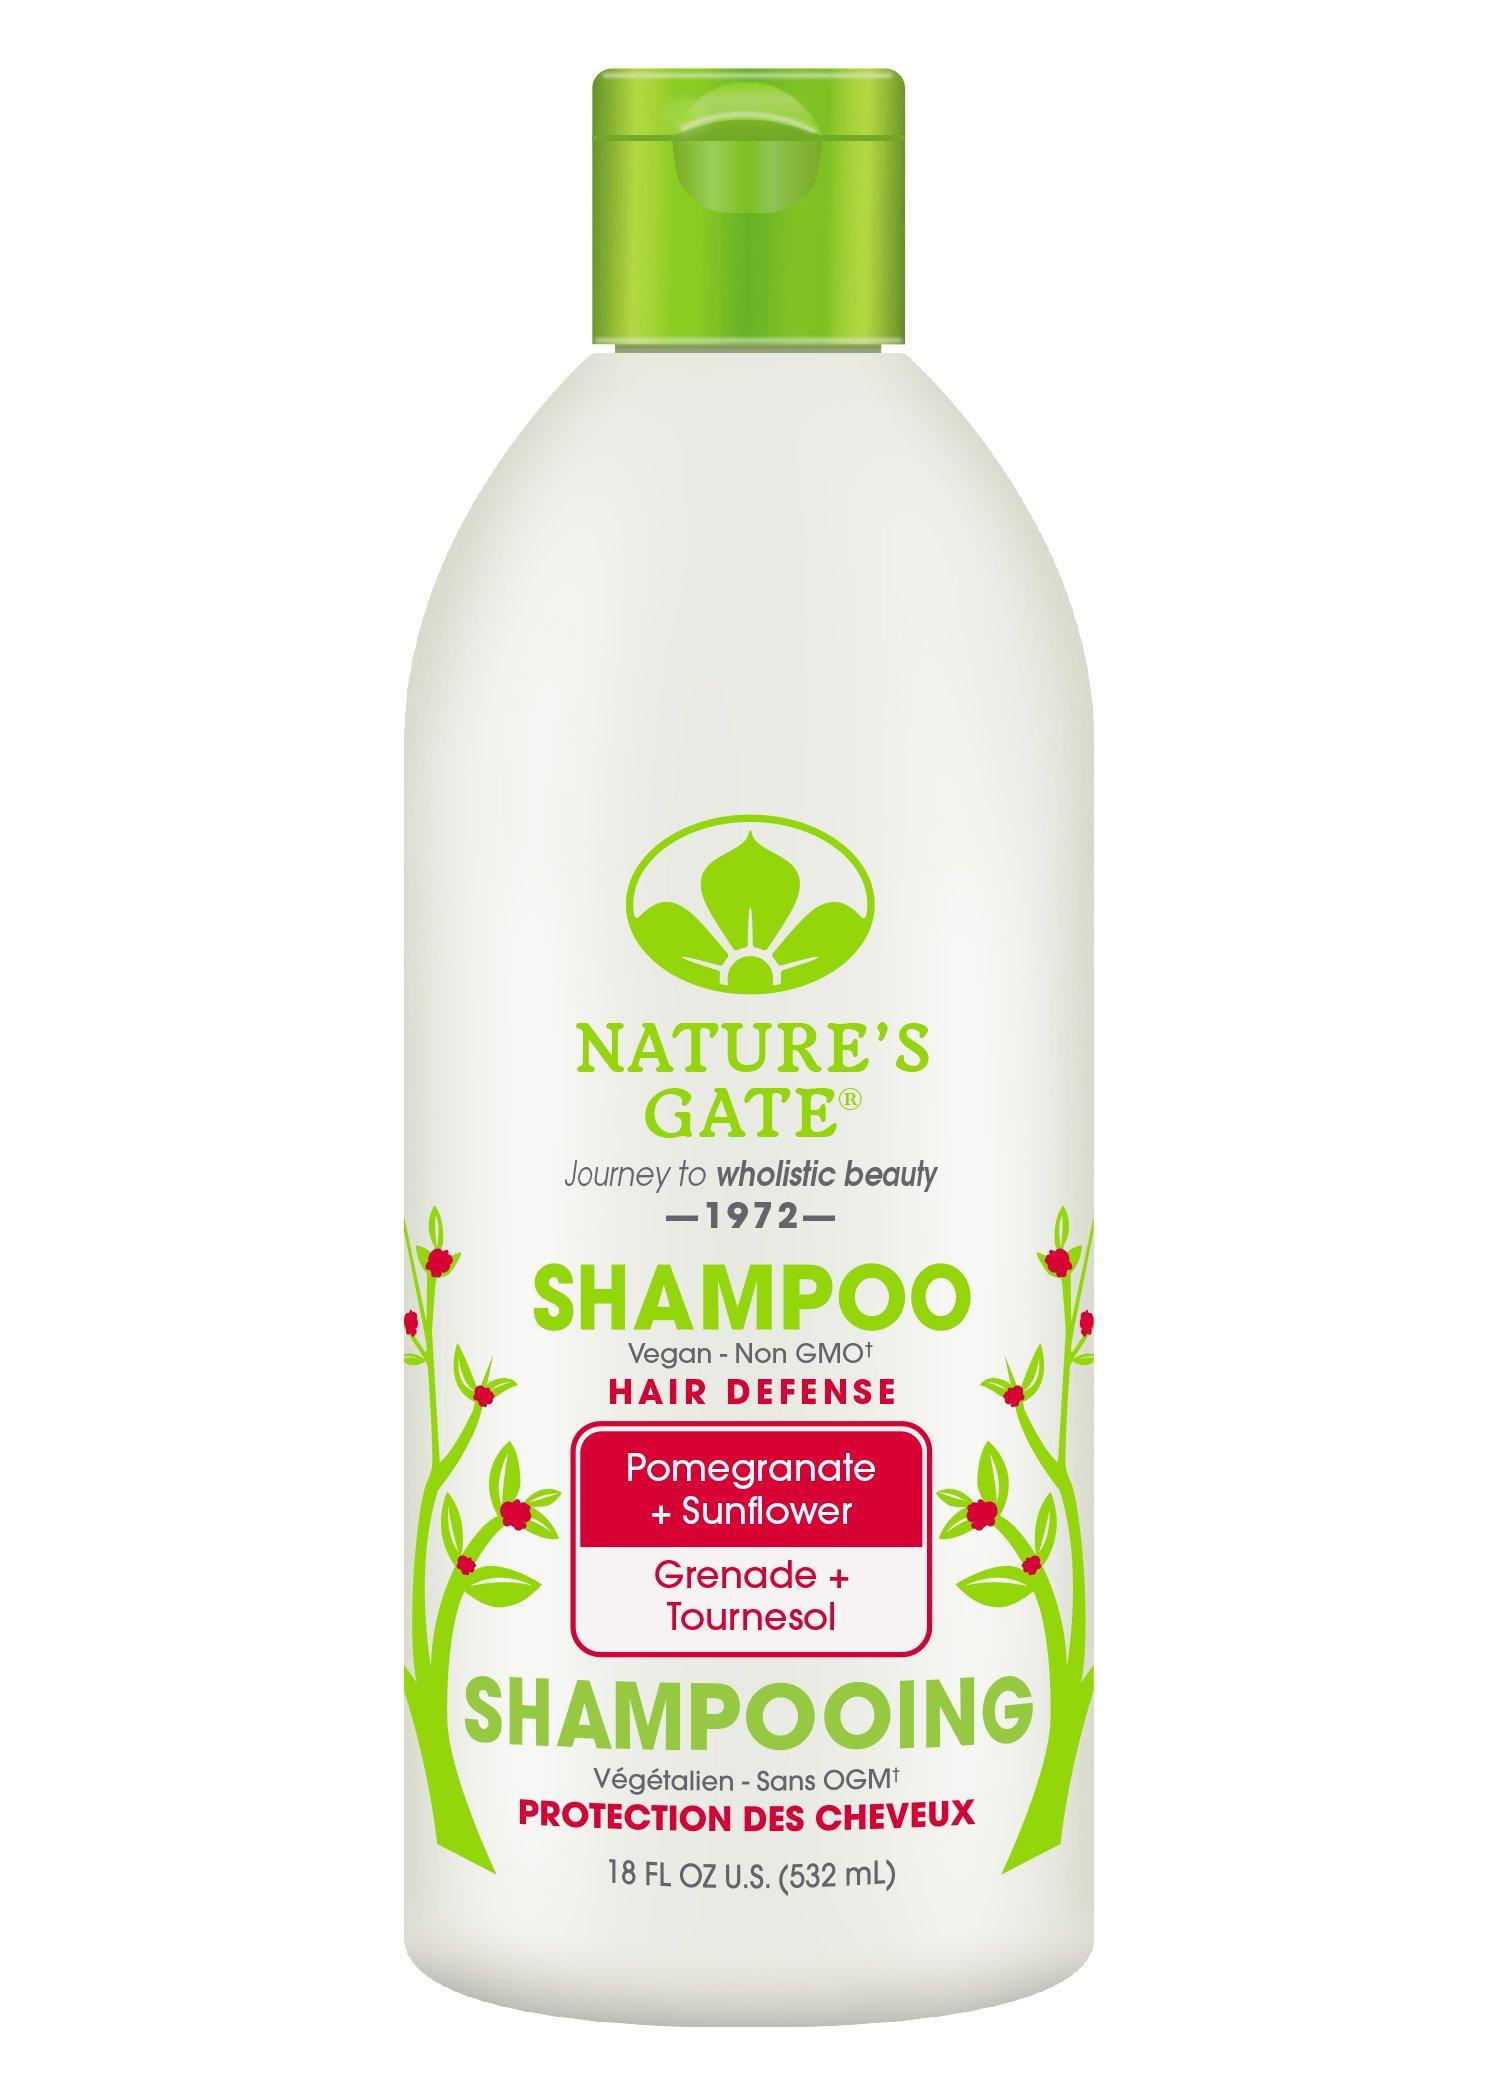 Nature S Gate Hair Defense Shampoo Pomegranate Sunflower